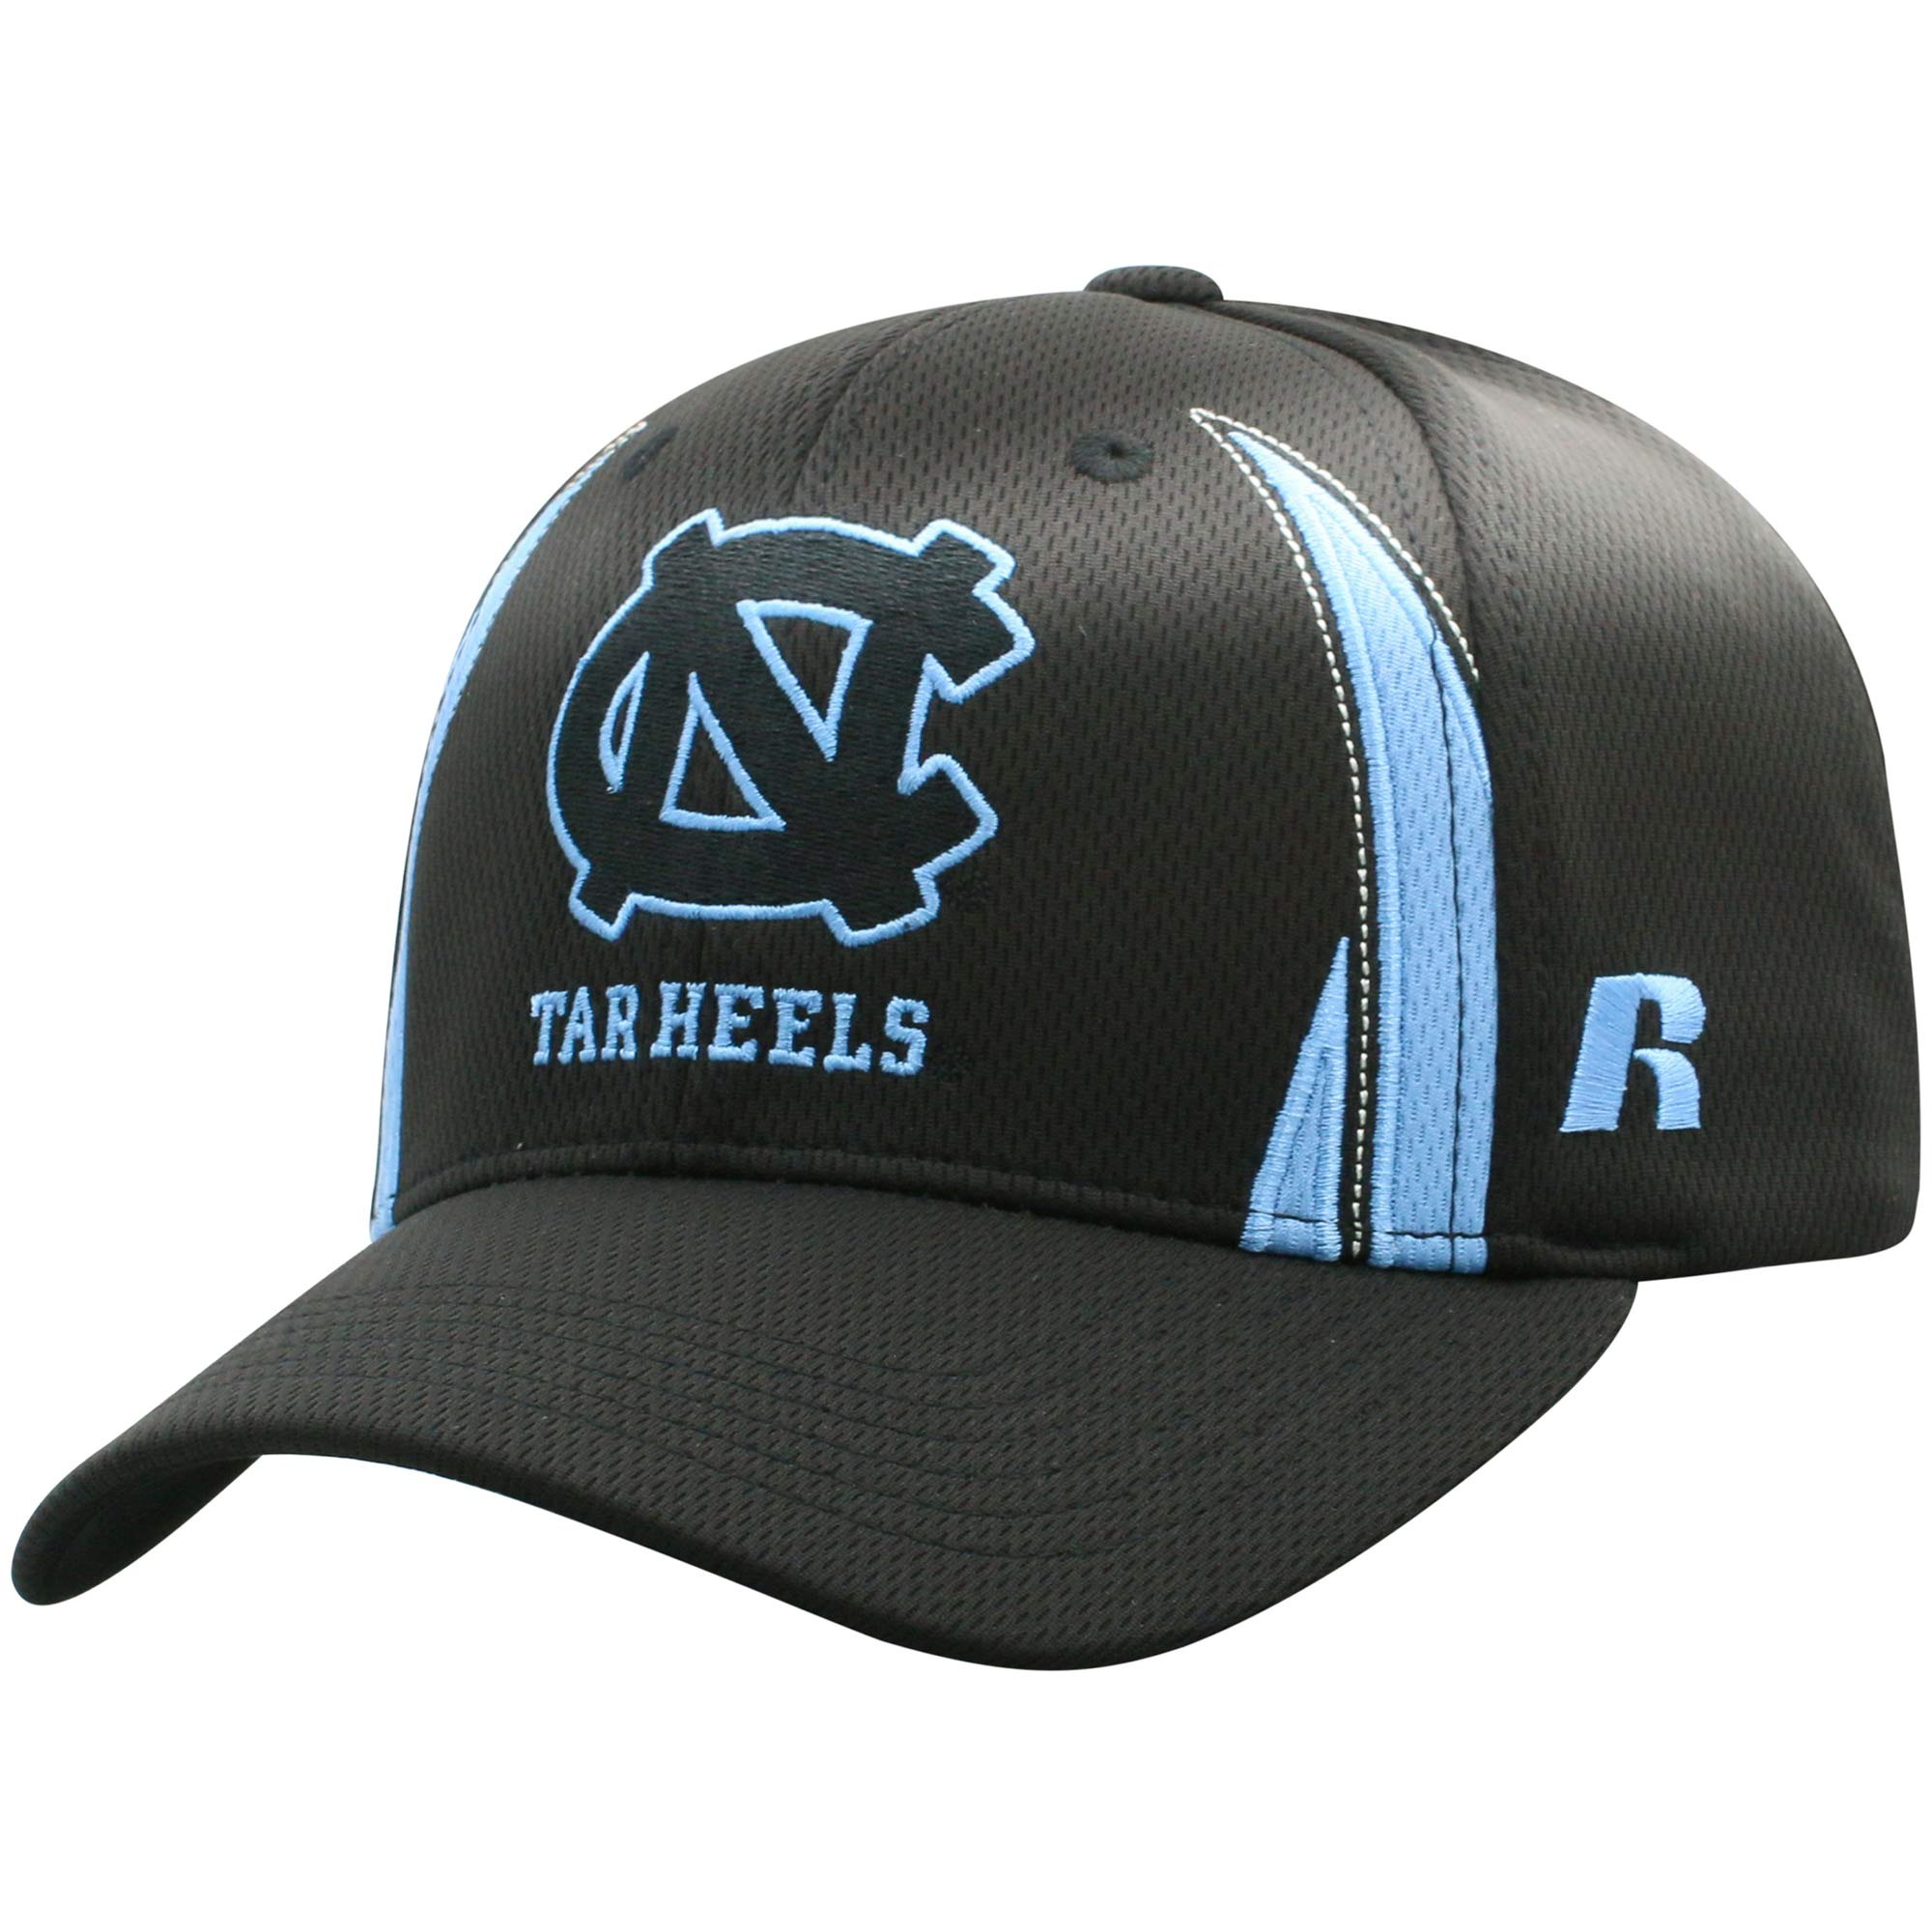 Men's Russell Black North Carolina Tar Heels React Adjustable Hat - OSFA